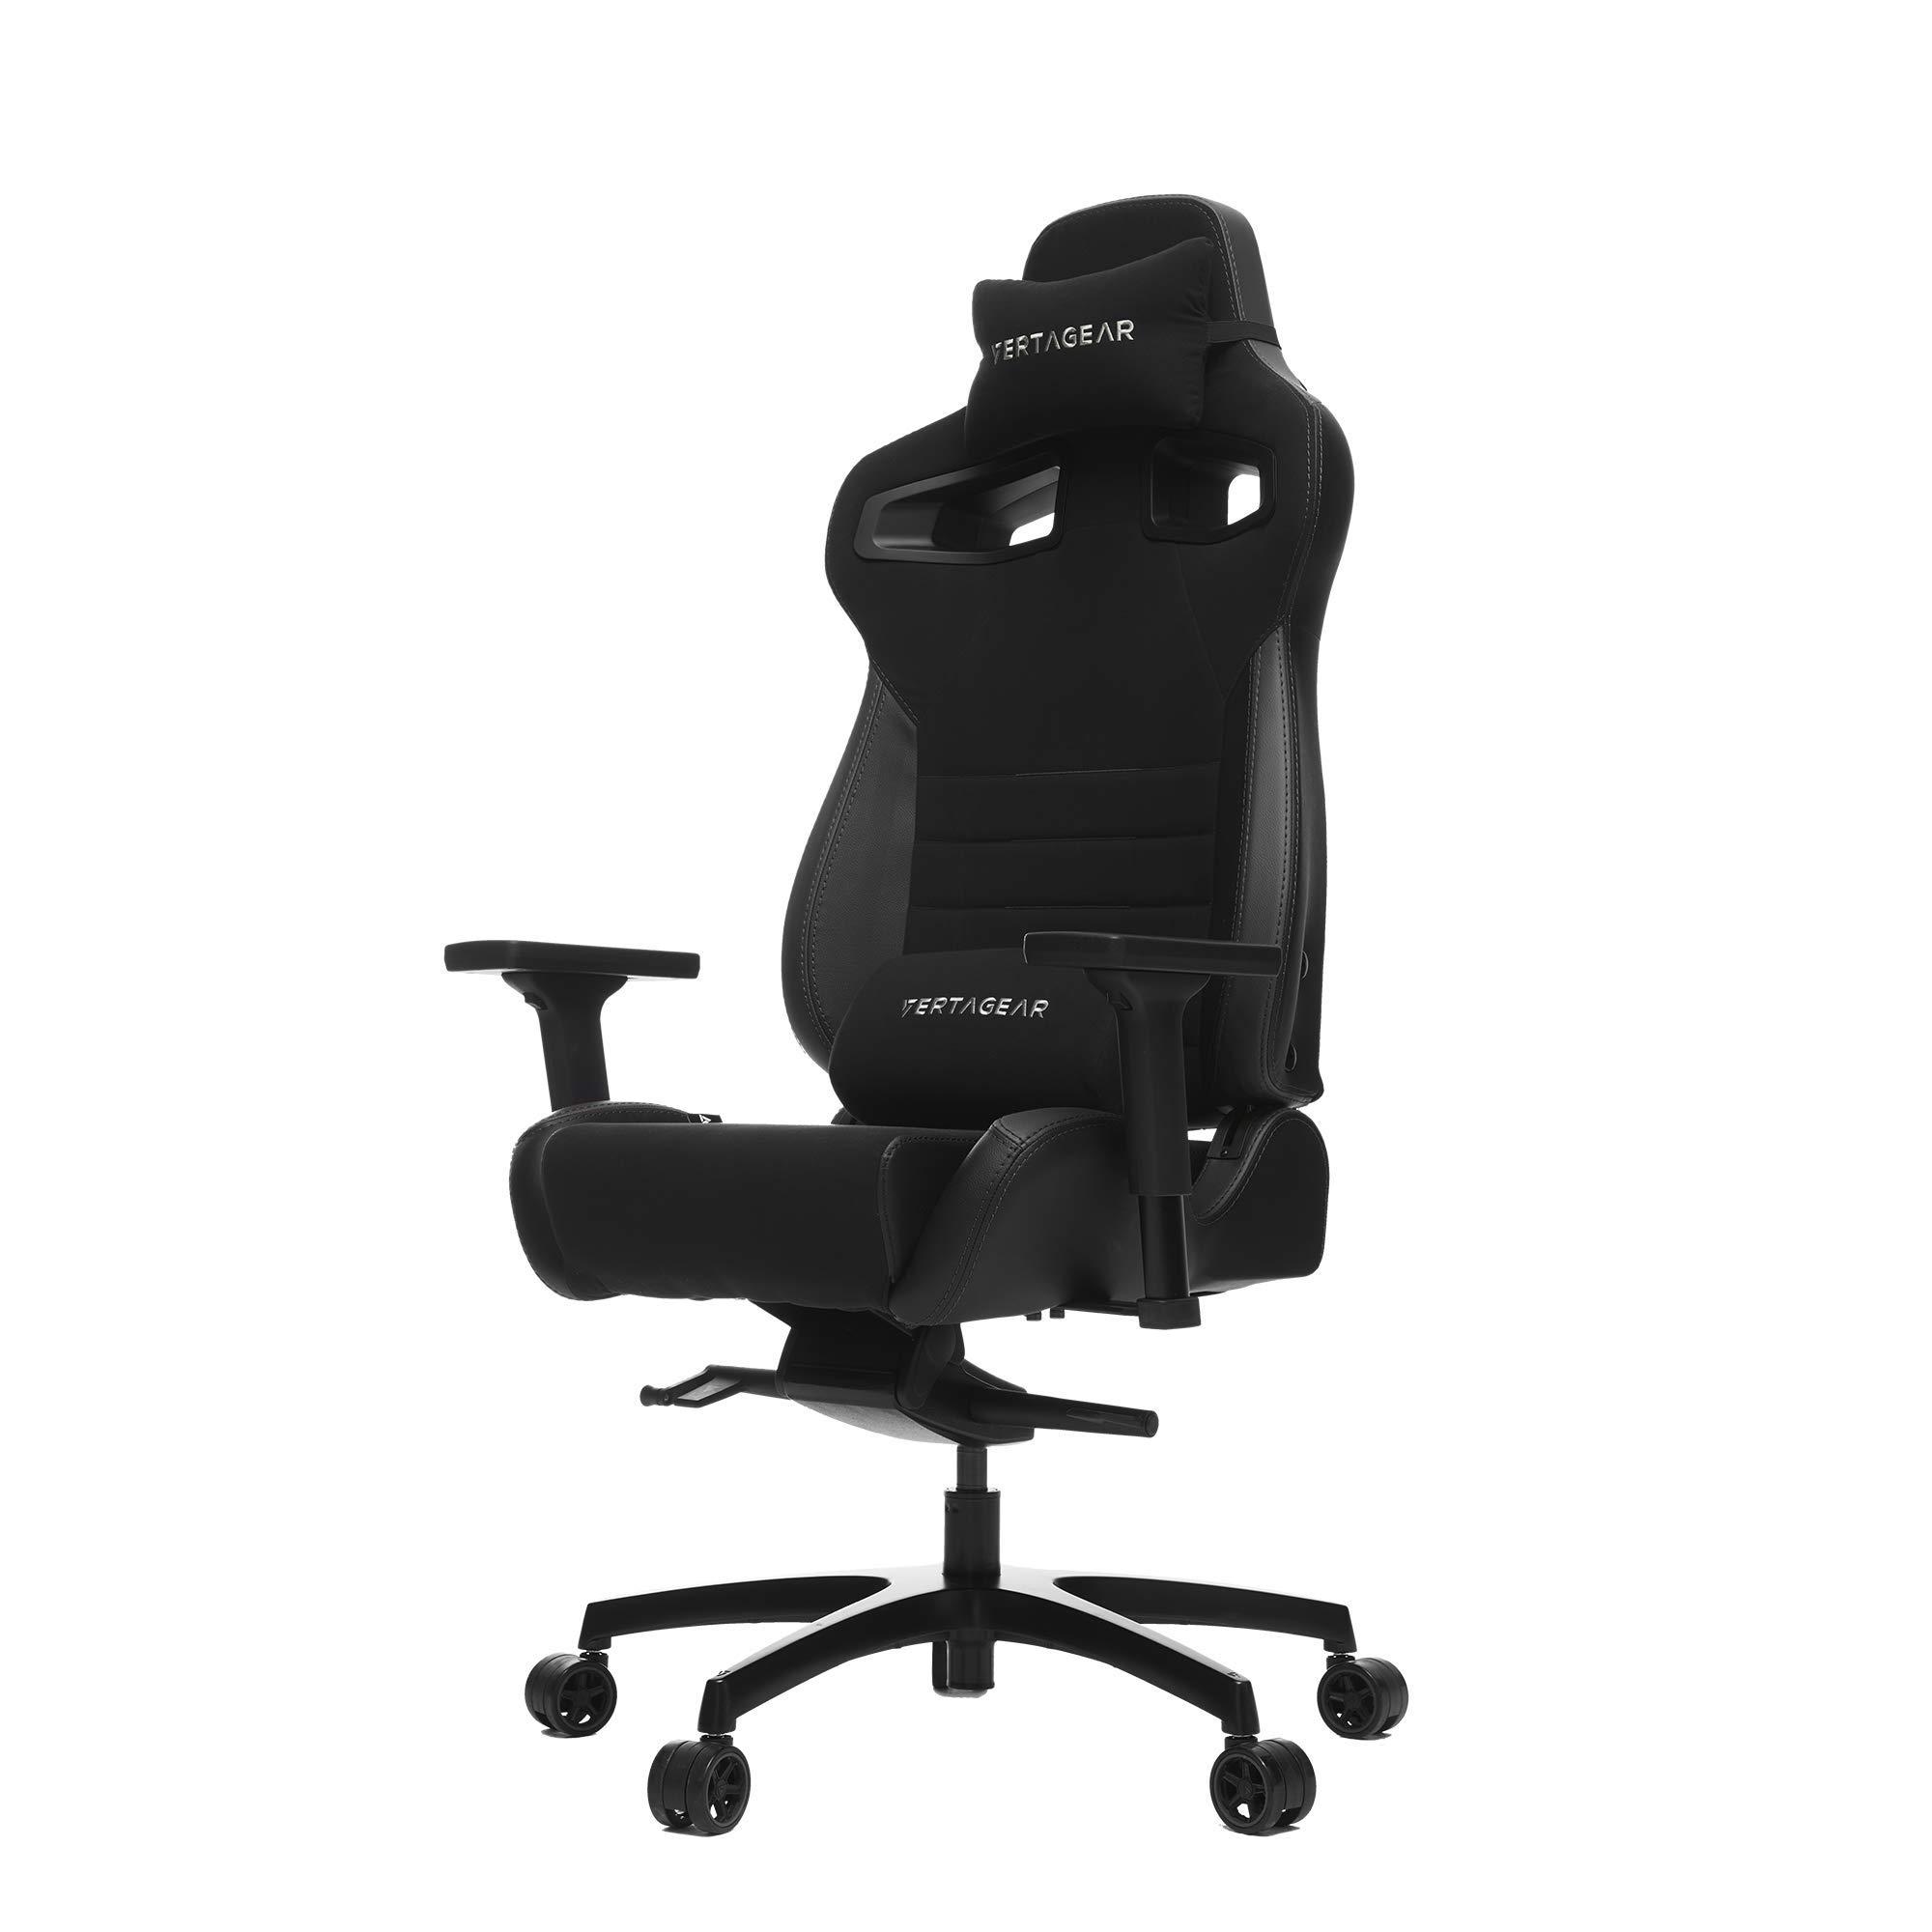 VERTAGEAR VG-PL4500_BK Racing Series P-Line PL4500 Gaming Chair Black/Carbon Edition by VERTAGEAR